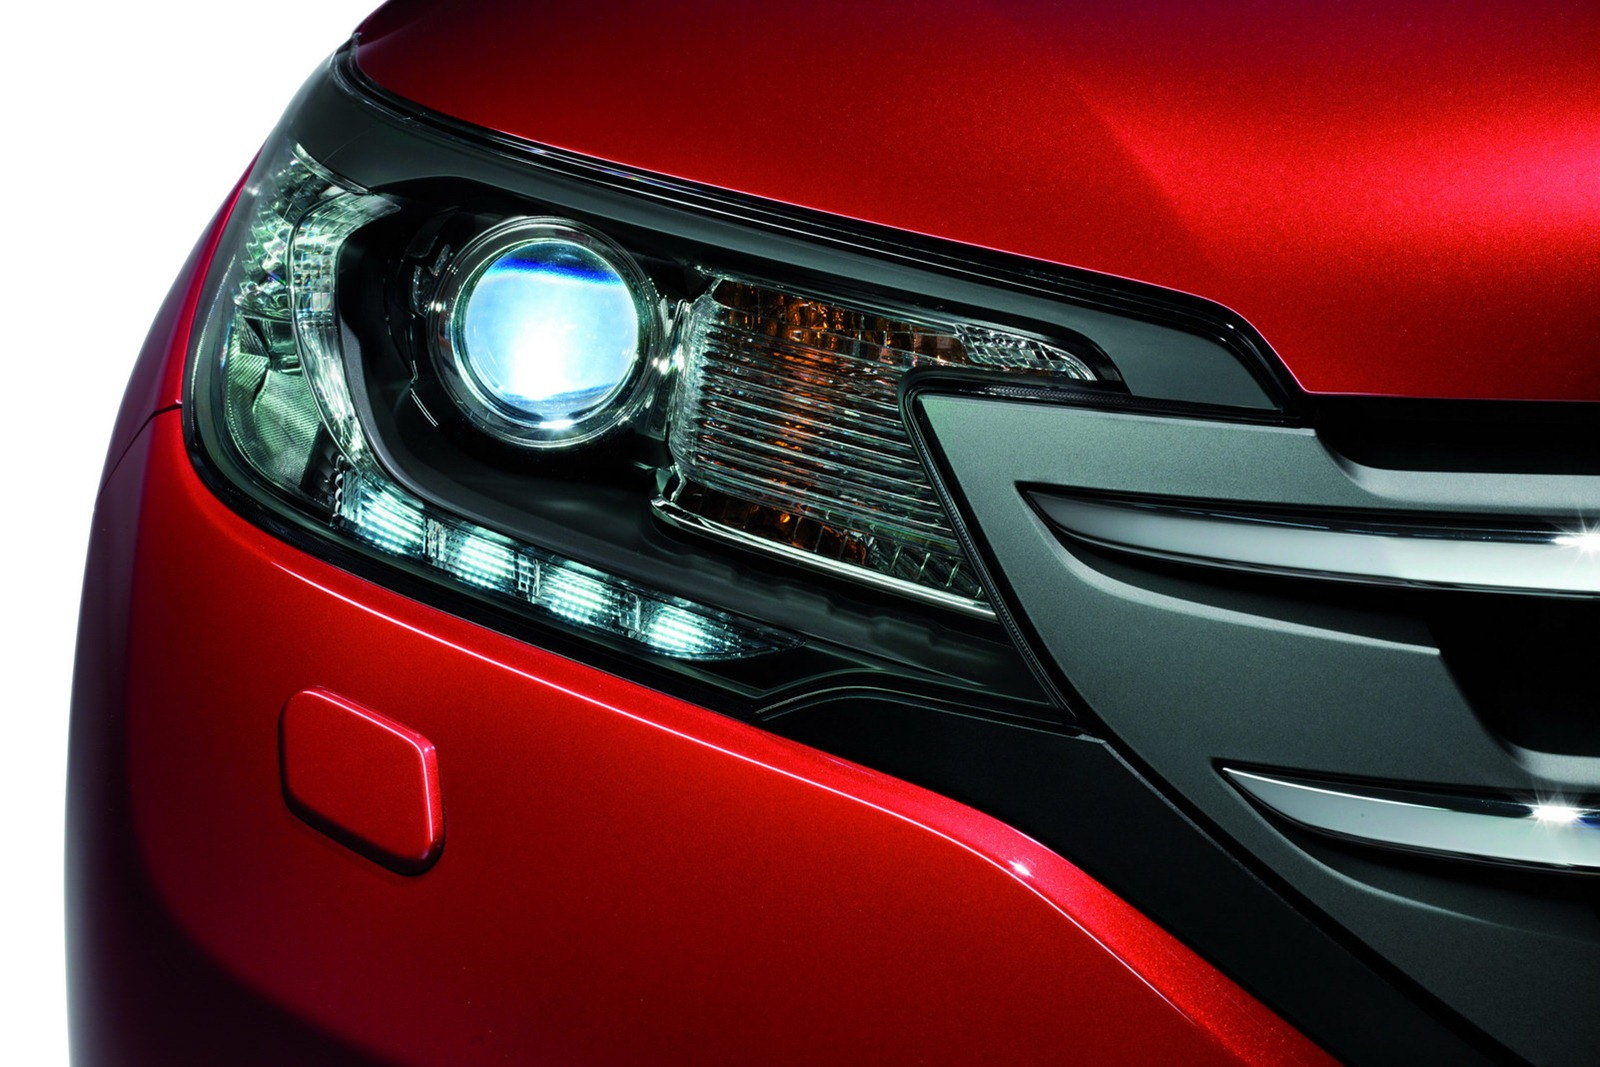 2013 CRV Honda